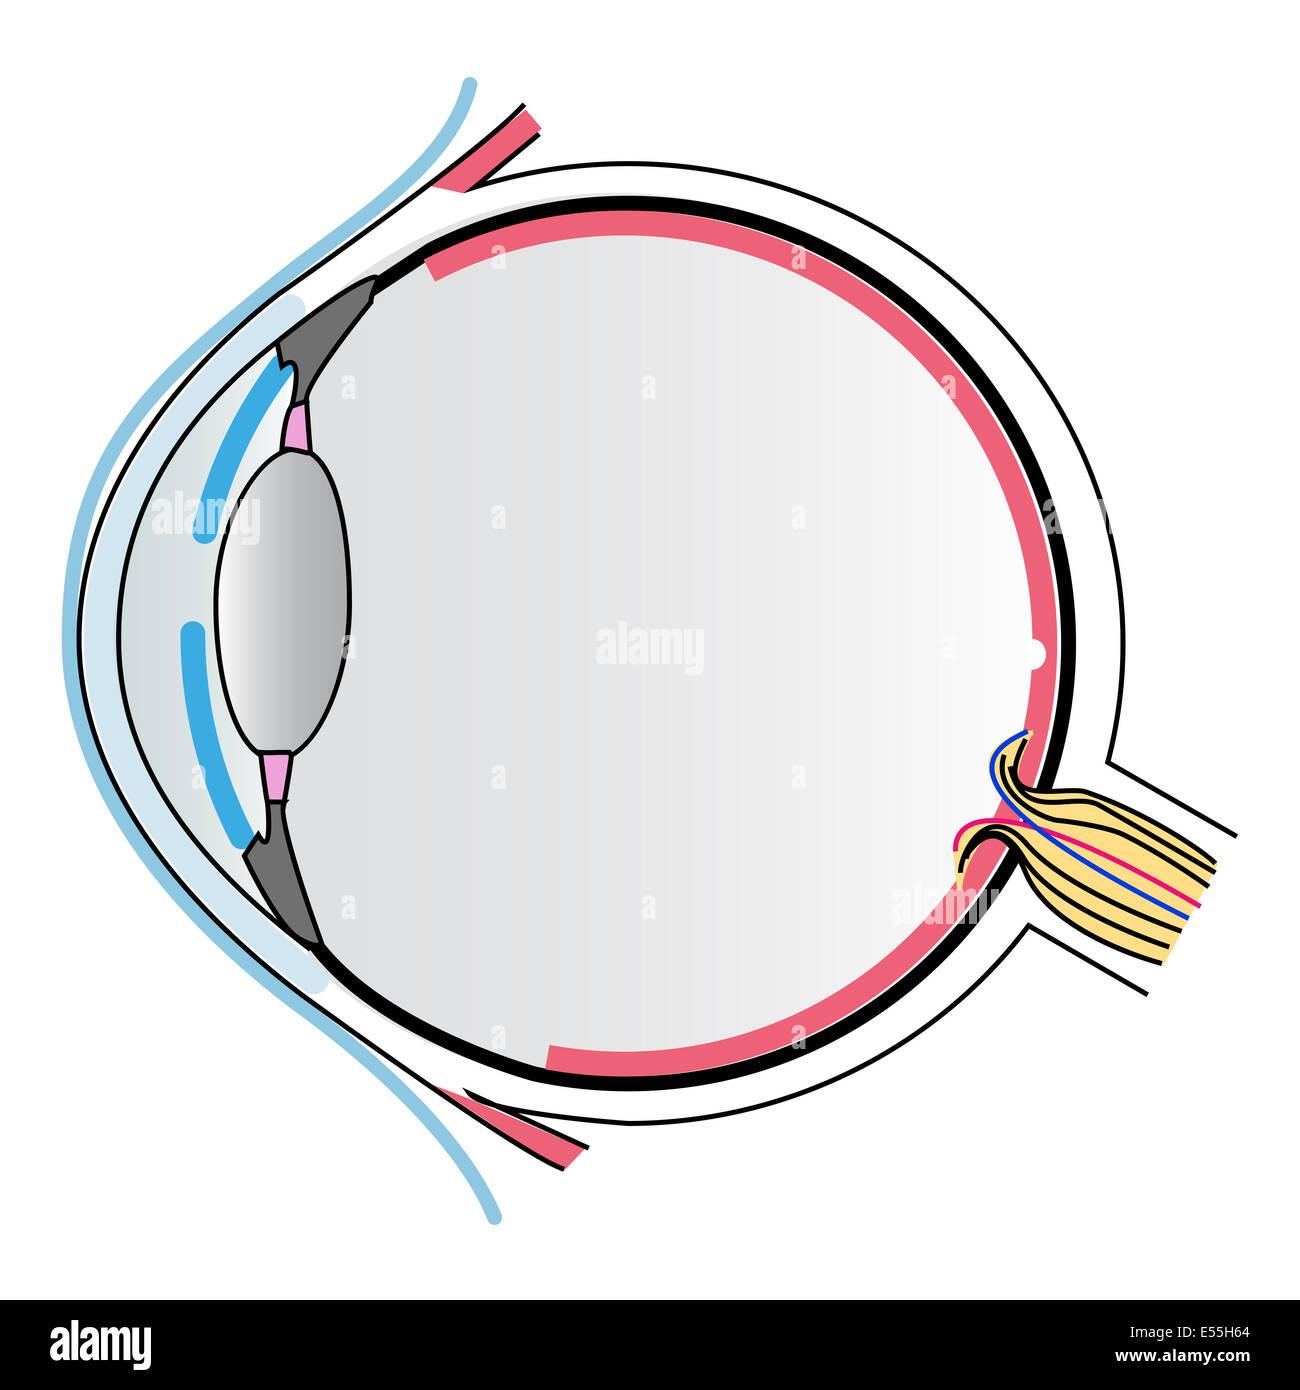 Eye Lens Diagram Stockfotos & Eye Lens Diagram Bilder - Alamy